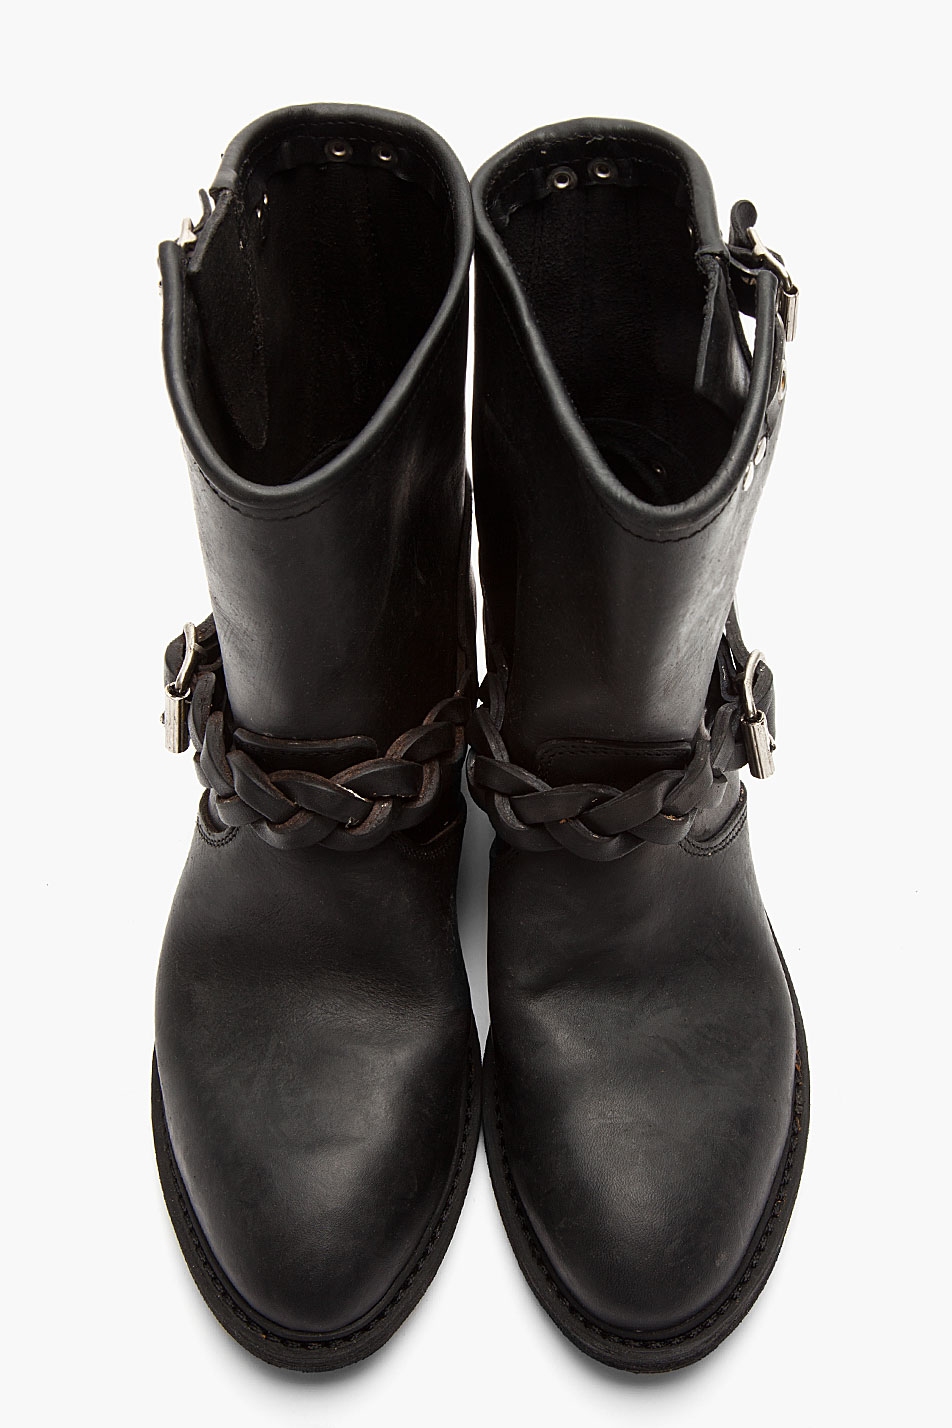 Golden Goose Biker boots rKtk0r